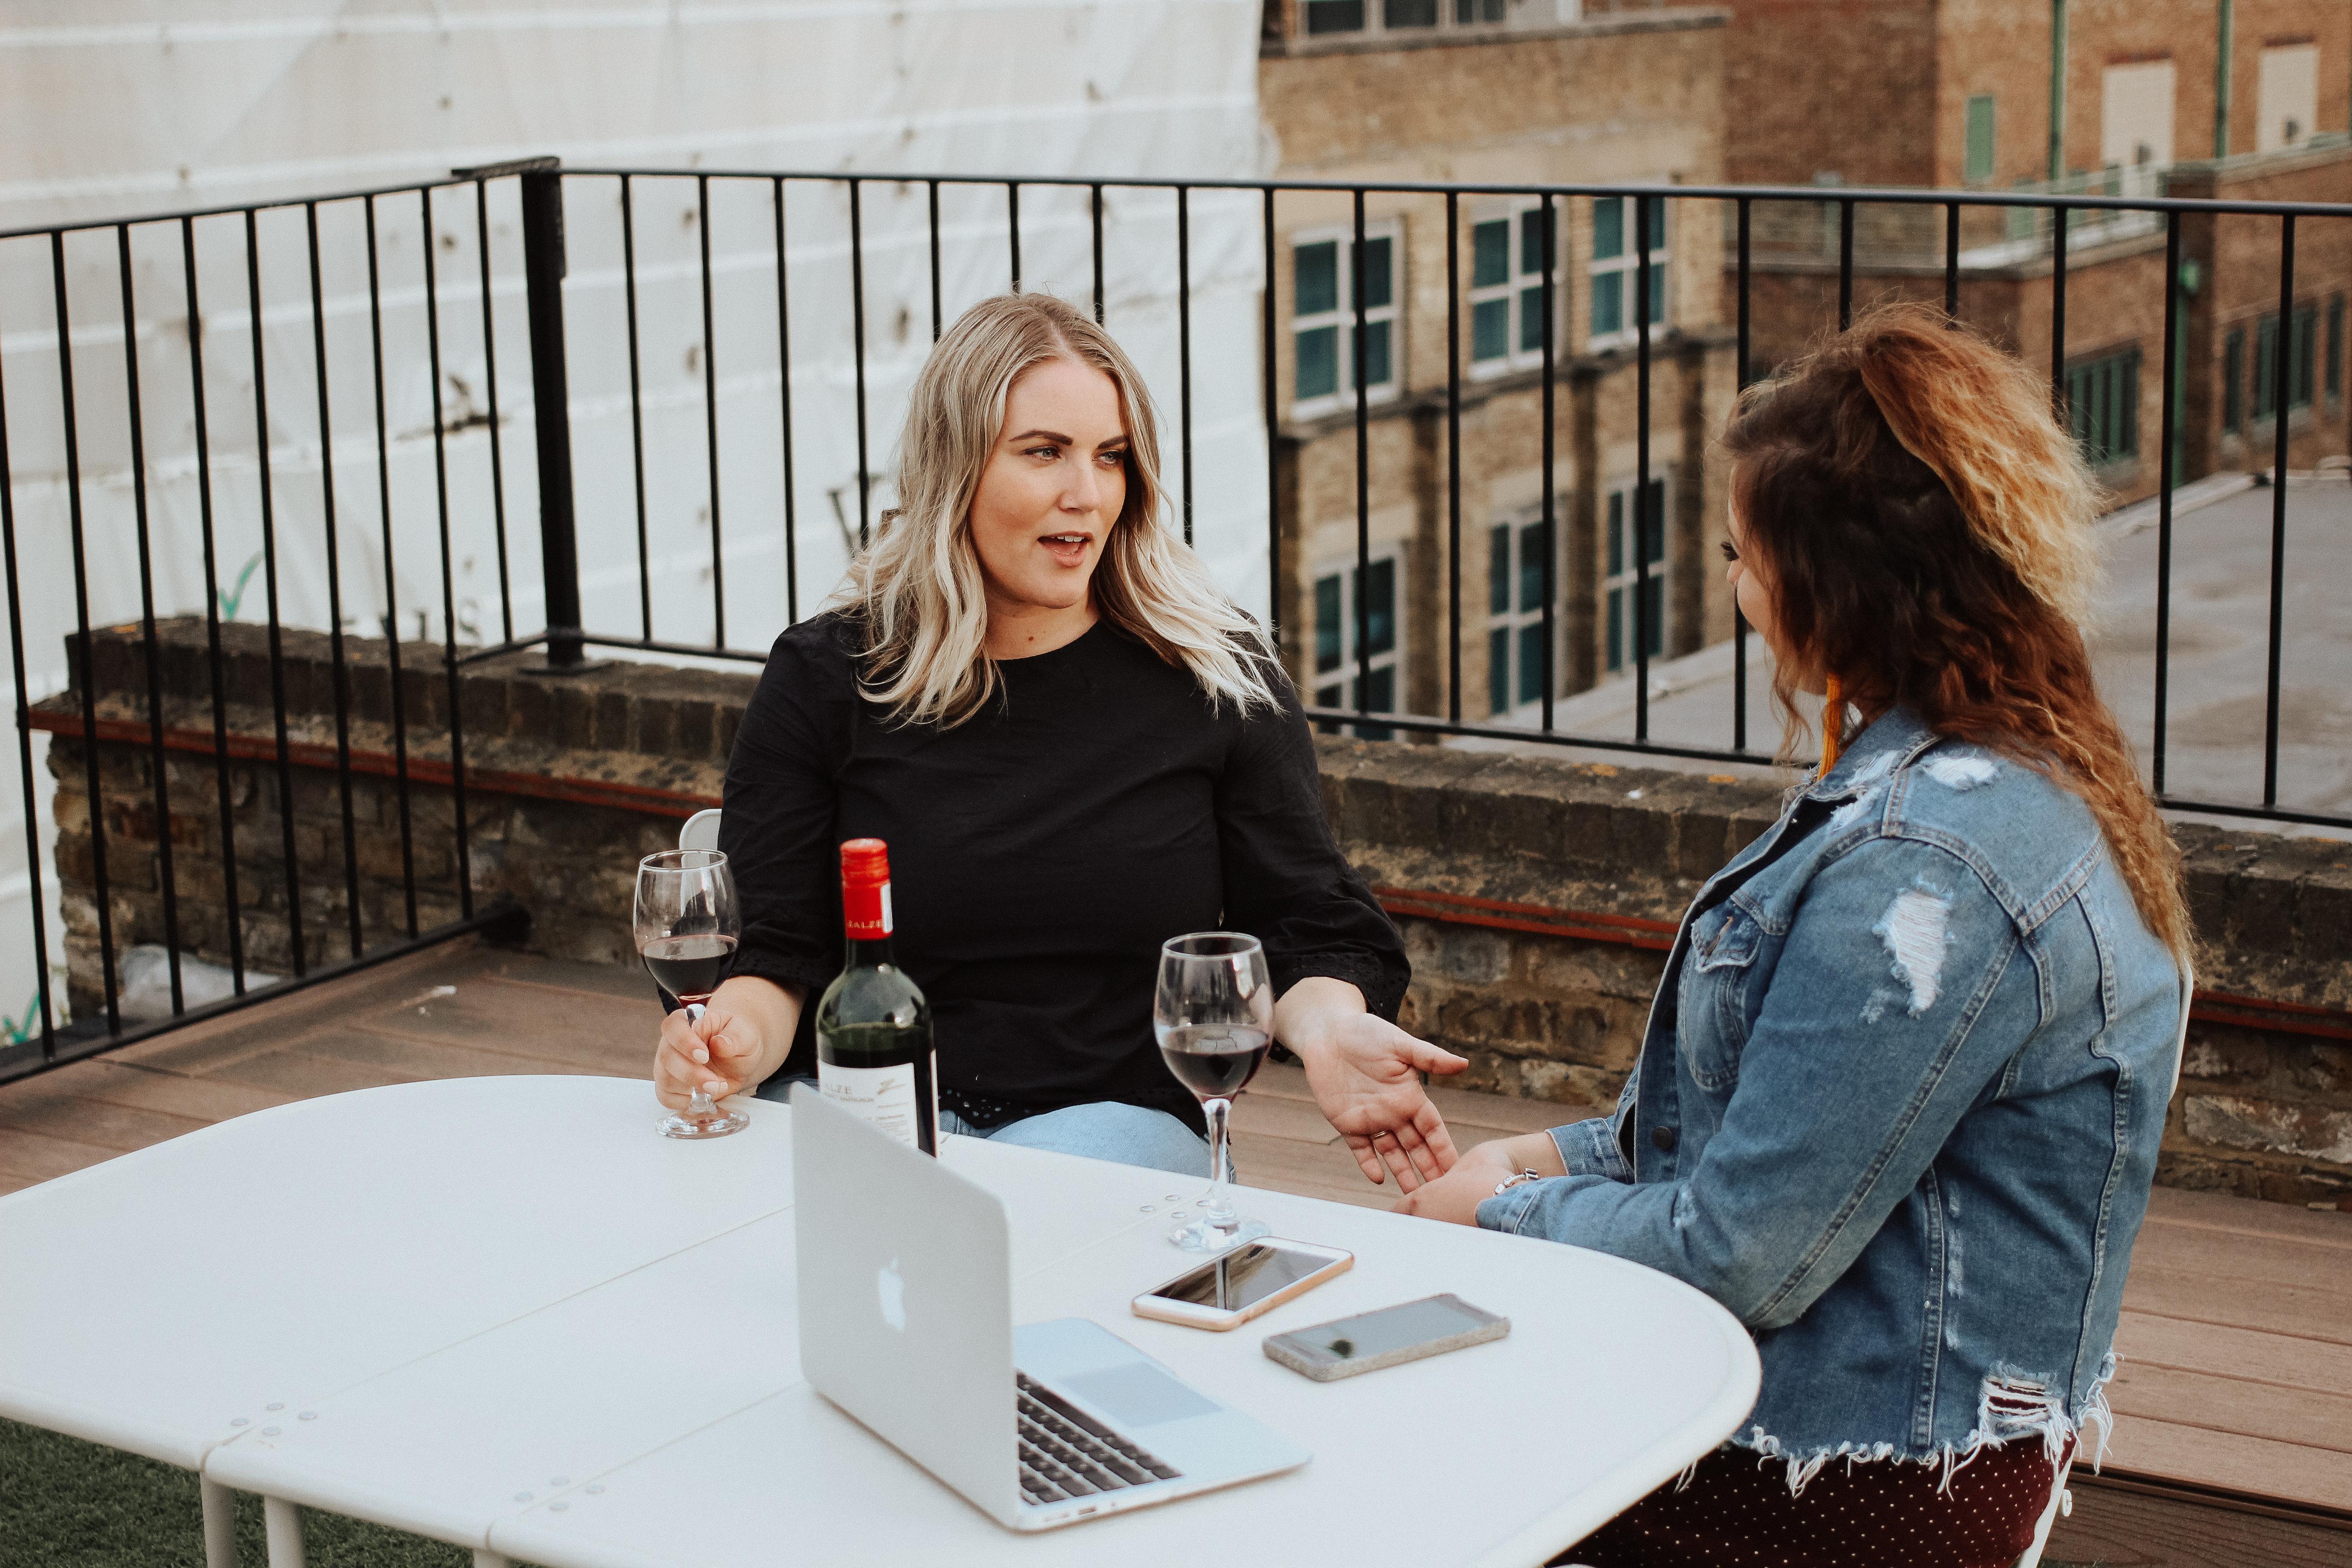 The Social Project, How To Make Friends, Social, Social Blogger, Social Media, Girl Boss, Entrepreneur, Creative, Collaboration, Barrie Wedding Planner, Barrie Social Media, Make Friends Club